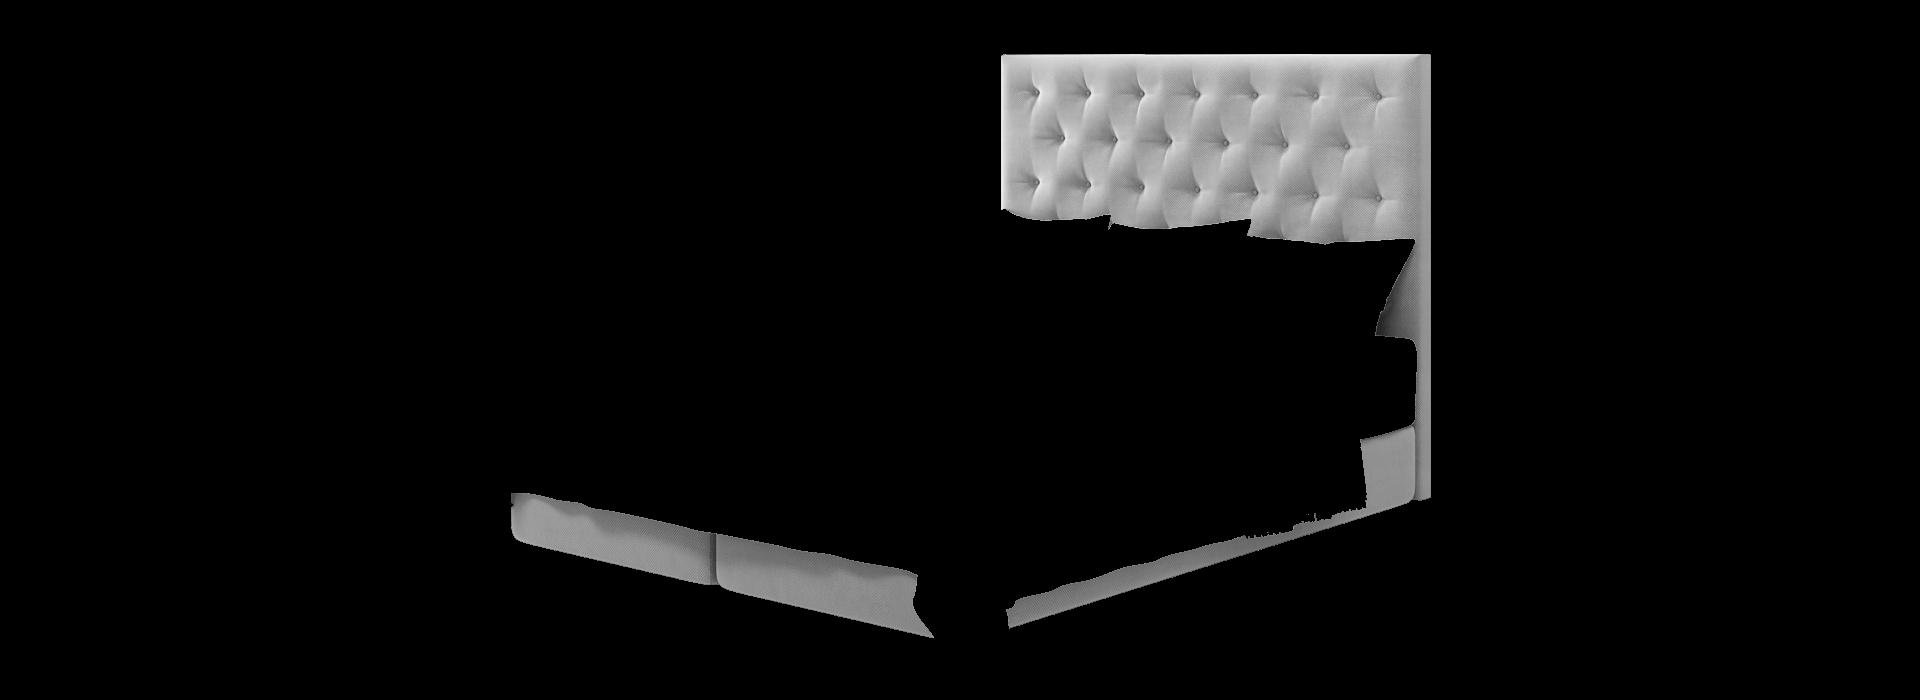 Естер 1.6 ліжко box spring - маска 4